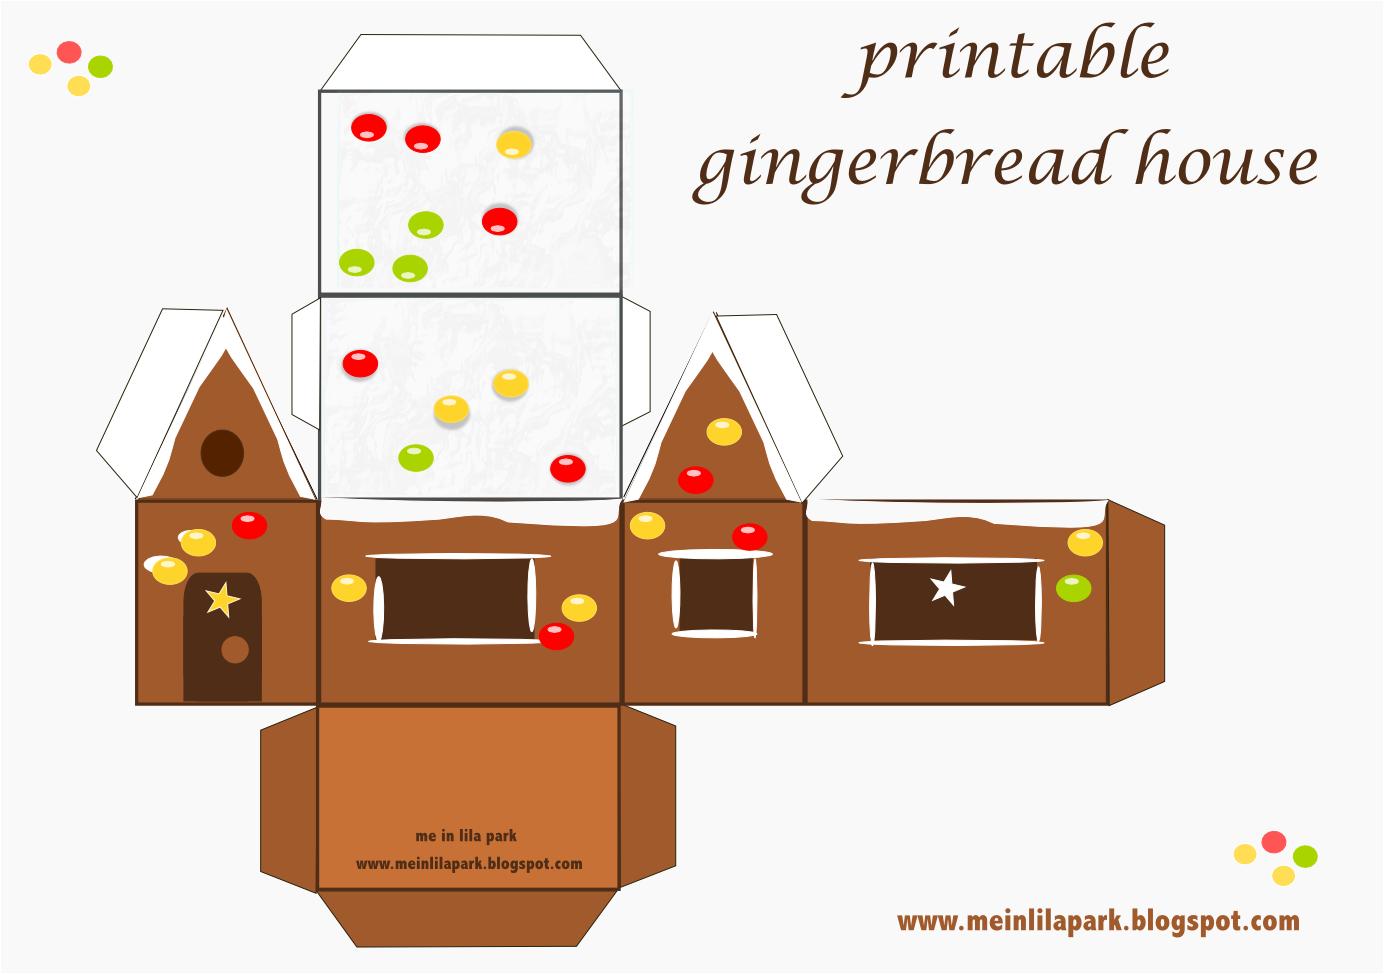 Free Printable Gingerbread House Ausdruckbares